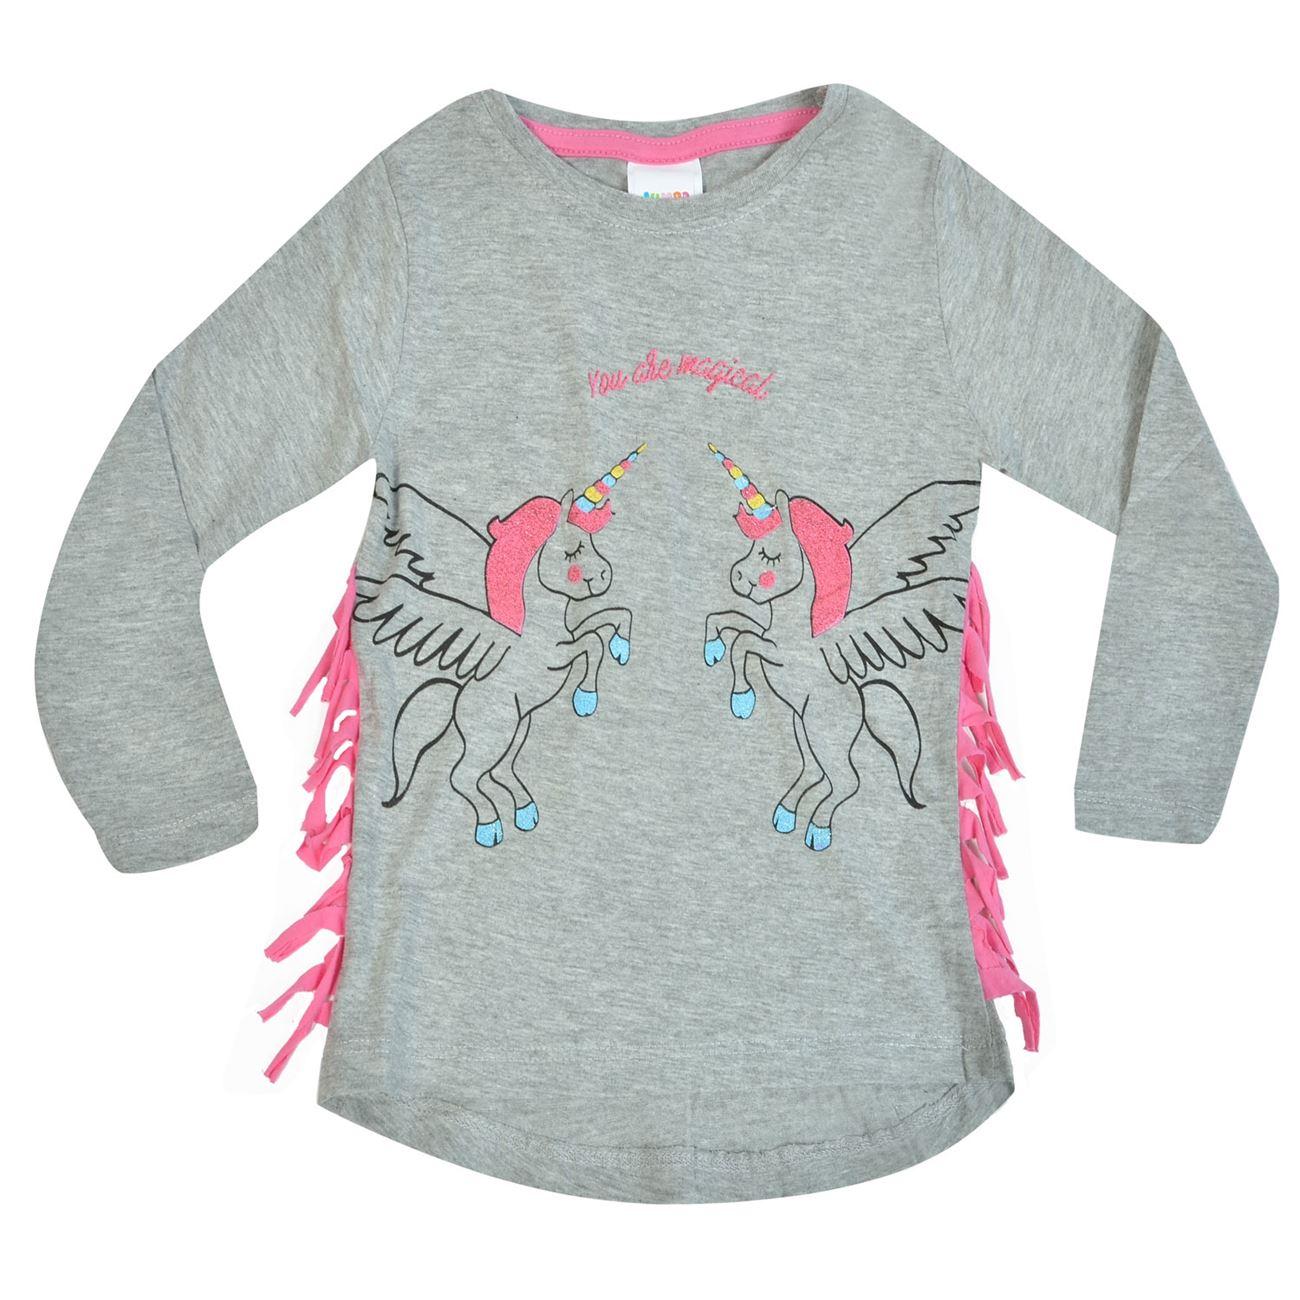 d443ca95154c Μπλούζα Μακρυμάνικη Παιδική Γκρι Μελανζέ Ροζ Κρόσσια Μονόκεροι   Μπλουζάκια  Μακό για Κορίτσια